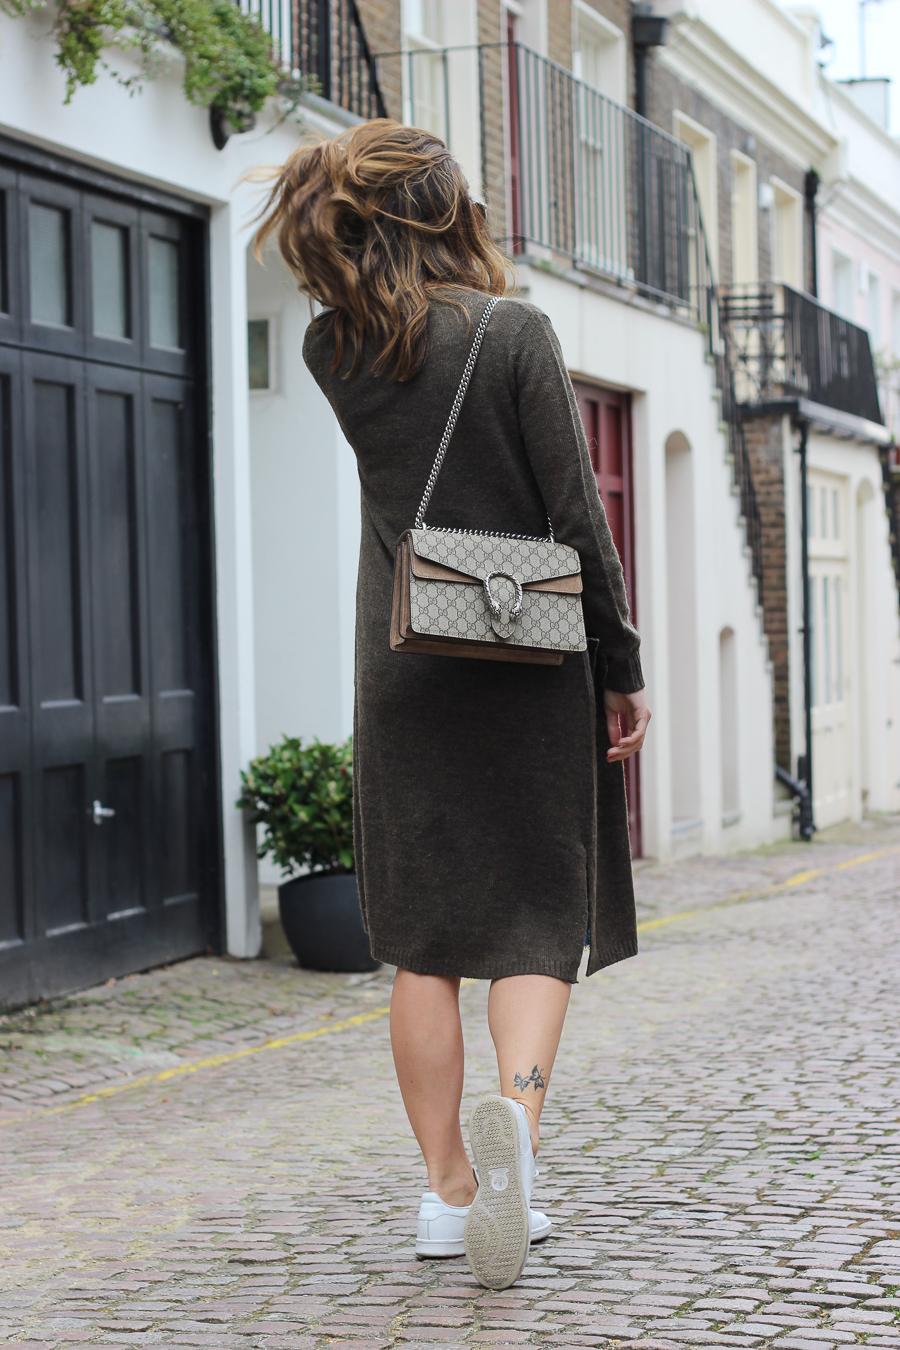 Clutch and carry on - uk fashion blogger - uk travel blogger - sabrina chakici - matalan cardigan, zara denim midi skirt, gucci dionysus supreme-7